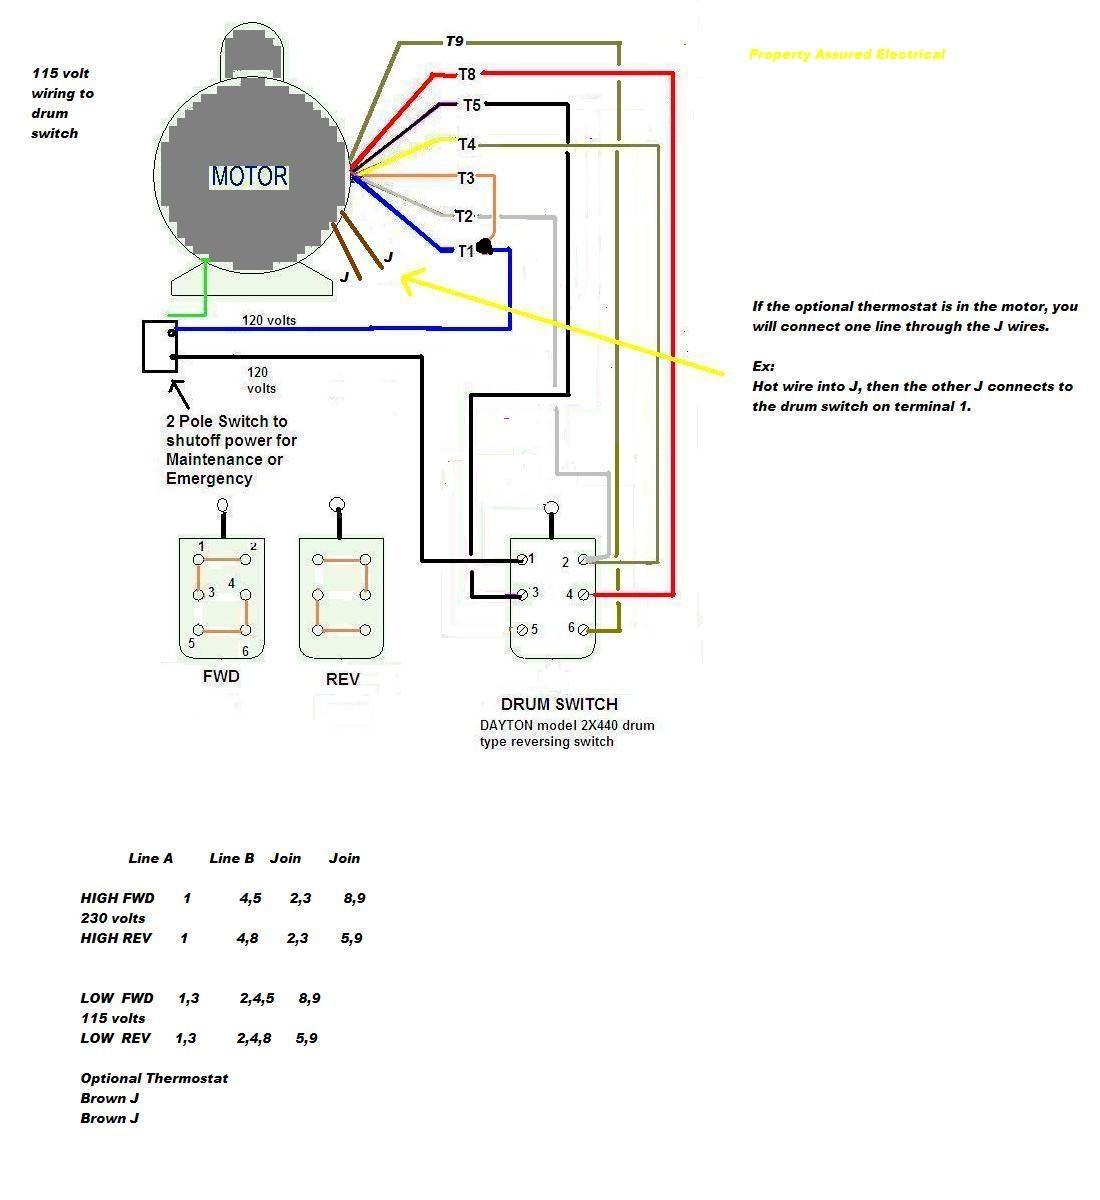 wiring diagram 2 120 volt repair machine 120 Volt Electrical Connectors and Plugs